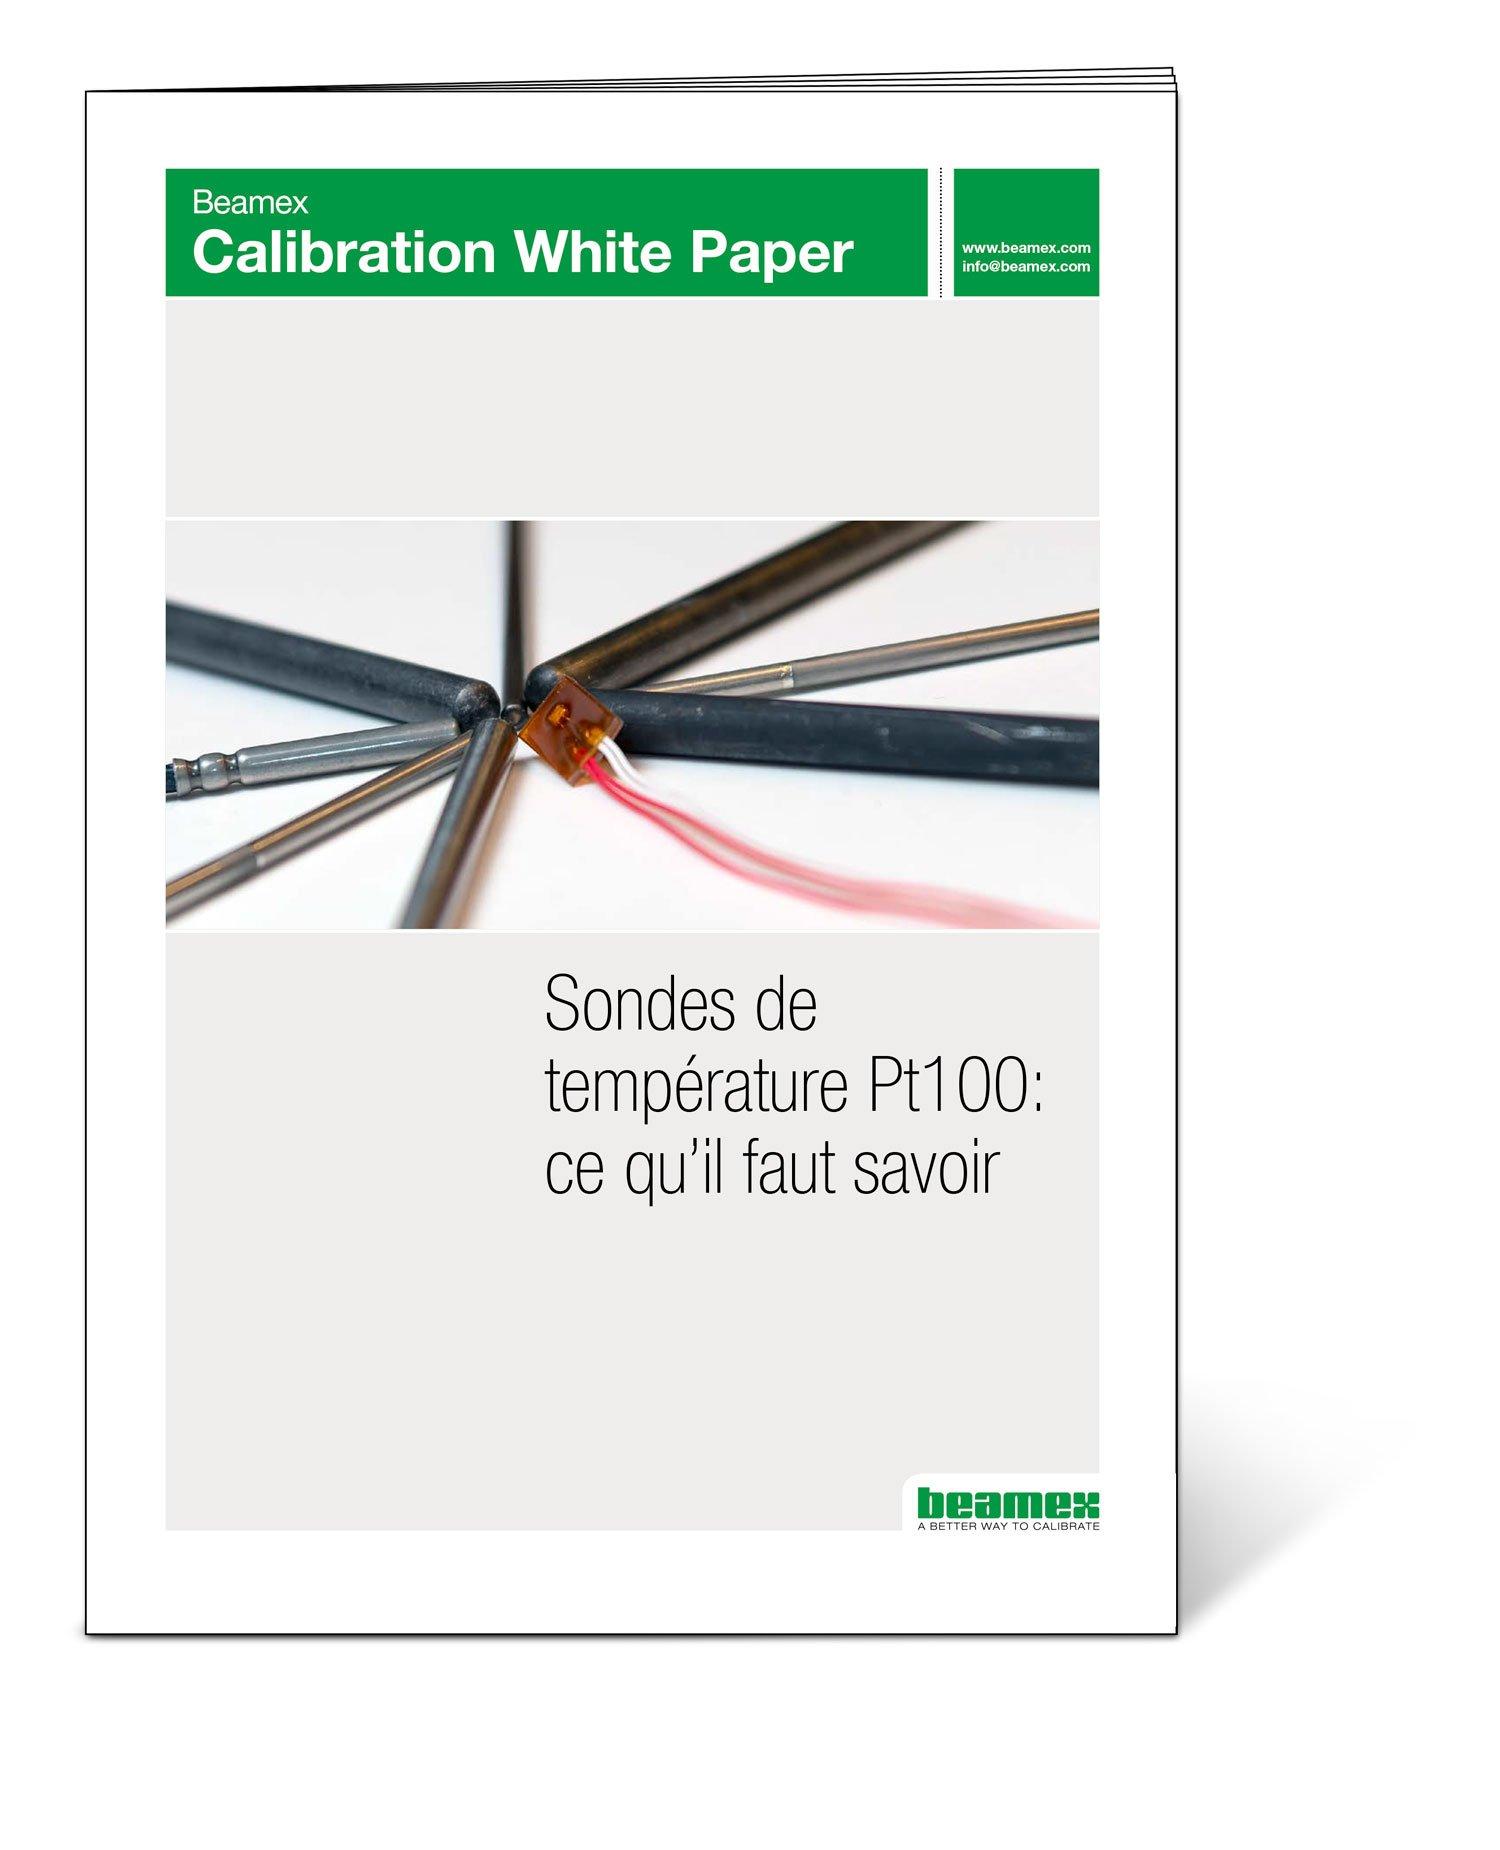 Beamex-WP-Pt100-temperature-sensor-1500px-v1_FRA